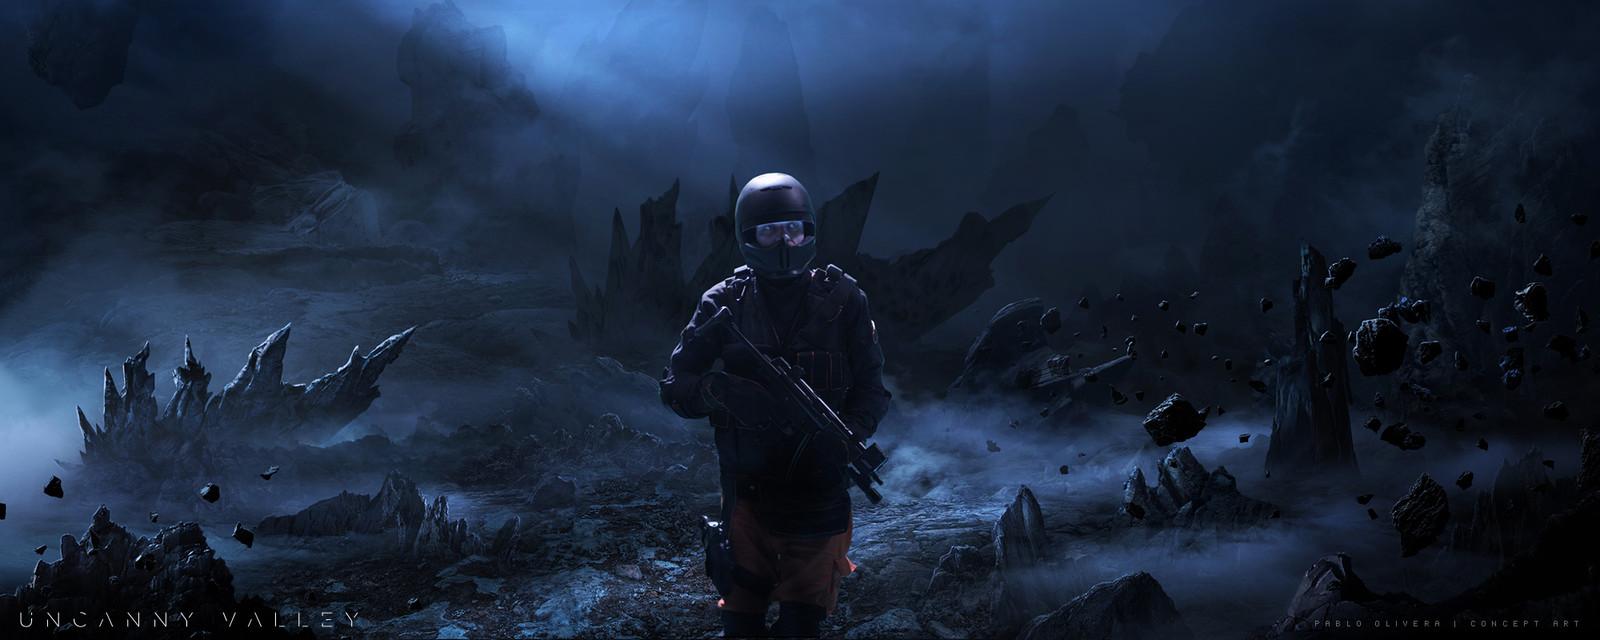 Uncanny Valley ( Sci-Fi short film ) Matte Painting,